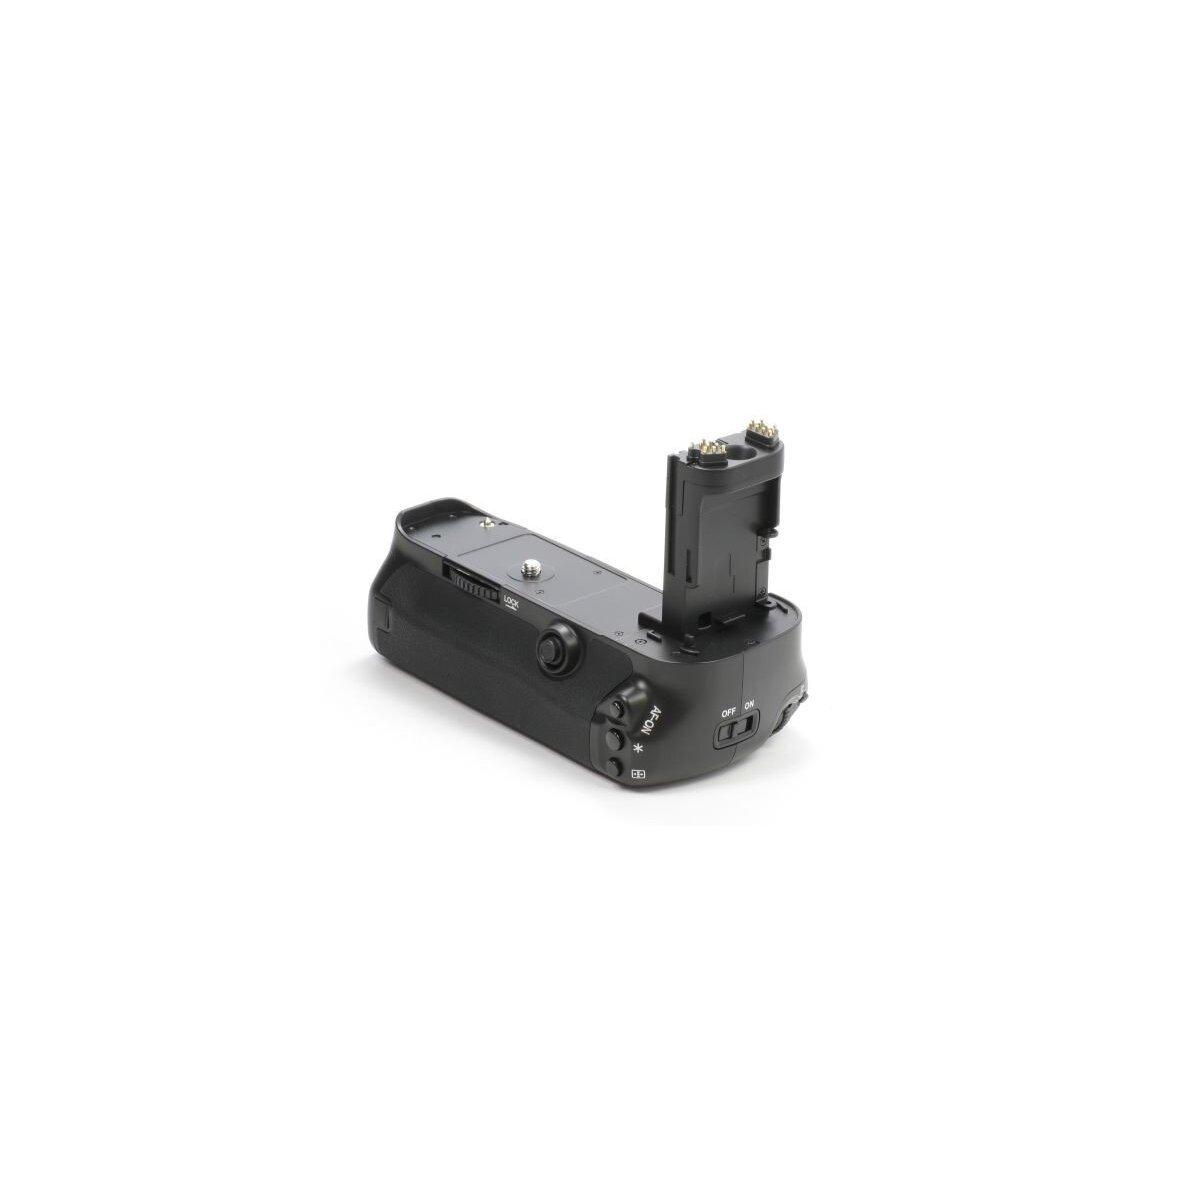 Profi Batteriegriff kompatibel mit Canon EOS 5DS, 5DS R, 5D Mark III als BG-E11 Ersatz für LP-E6 Akkus